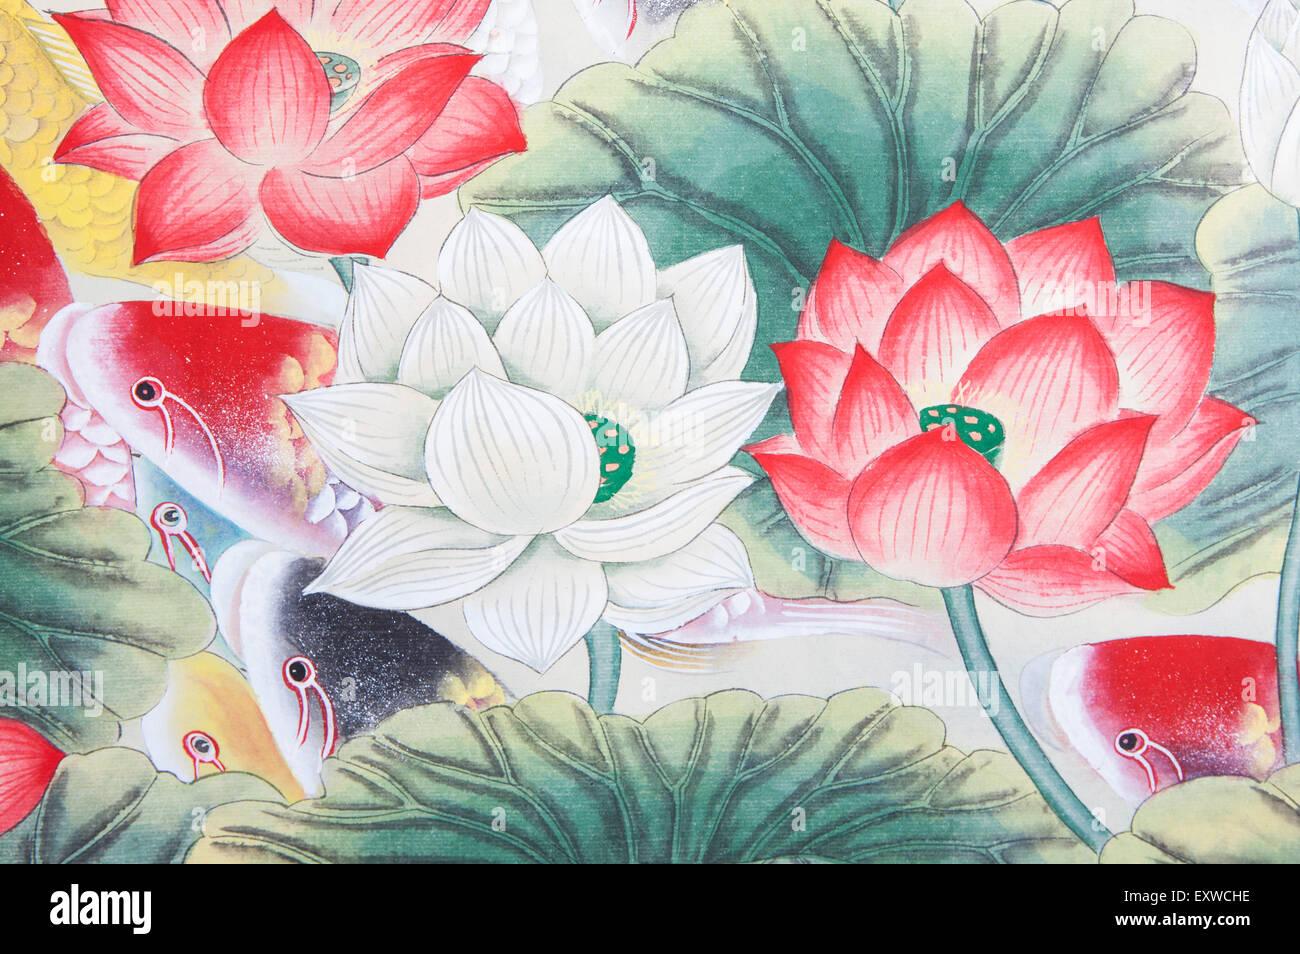 Traditional chinese painting koi carp lotus stock photo 85381226 traditional chinese painting koi carp lotus izmirmasajfo